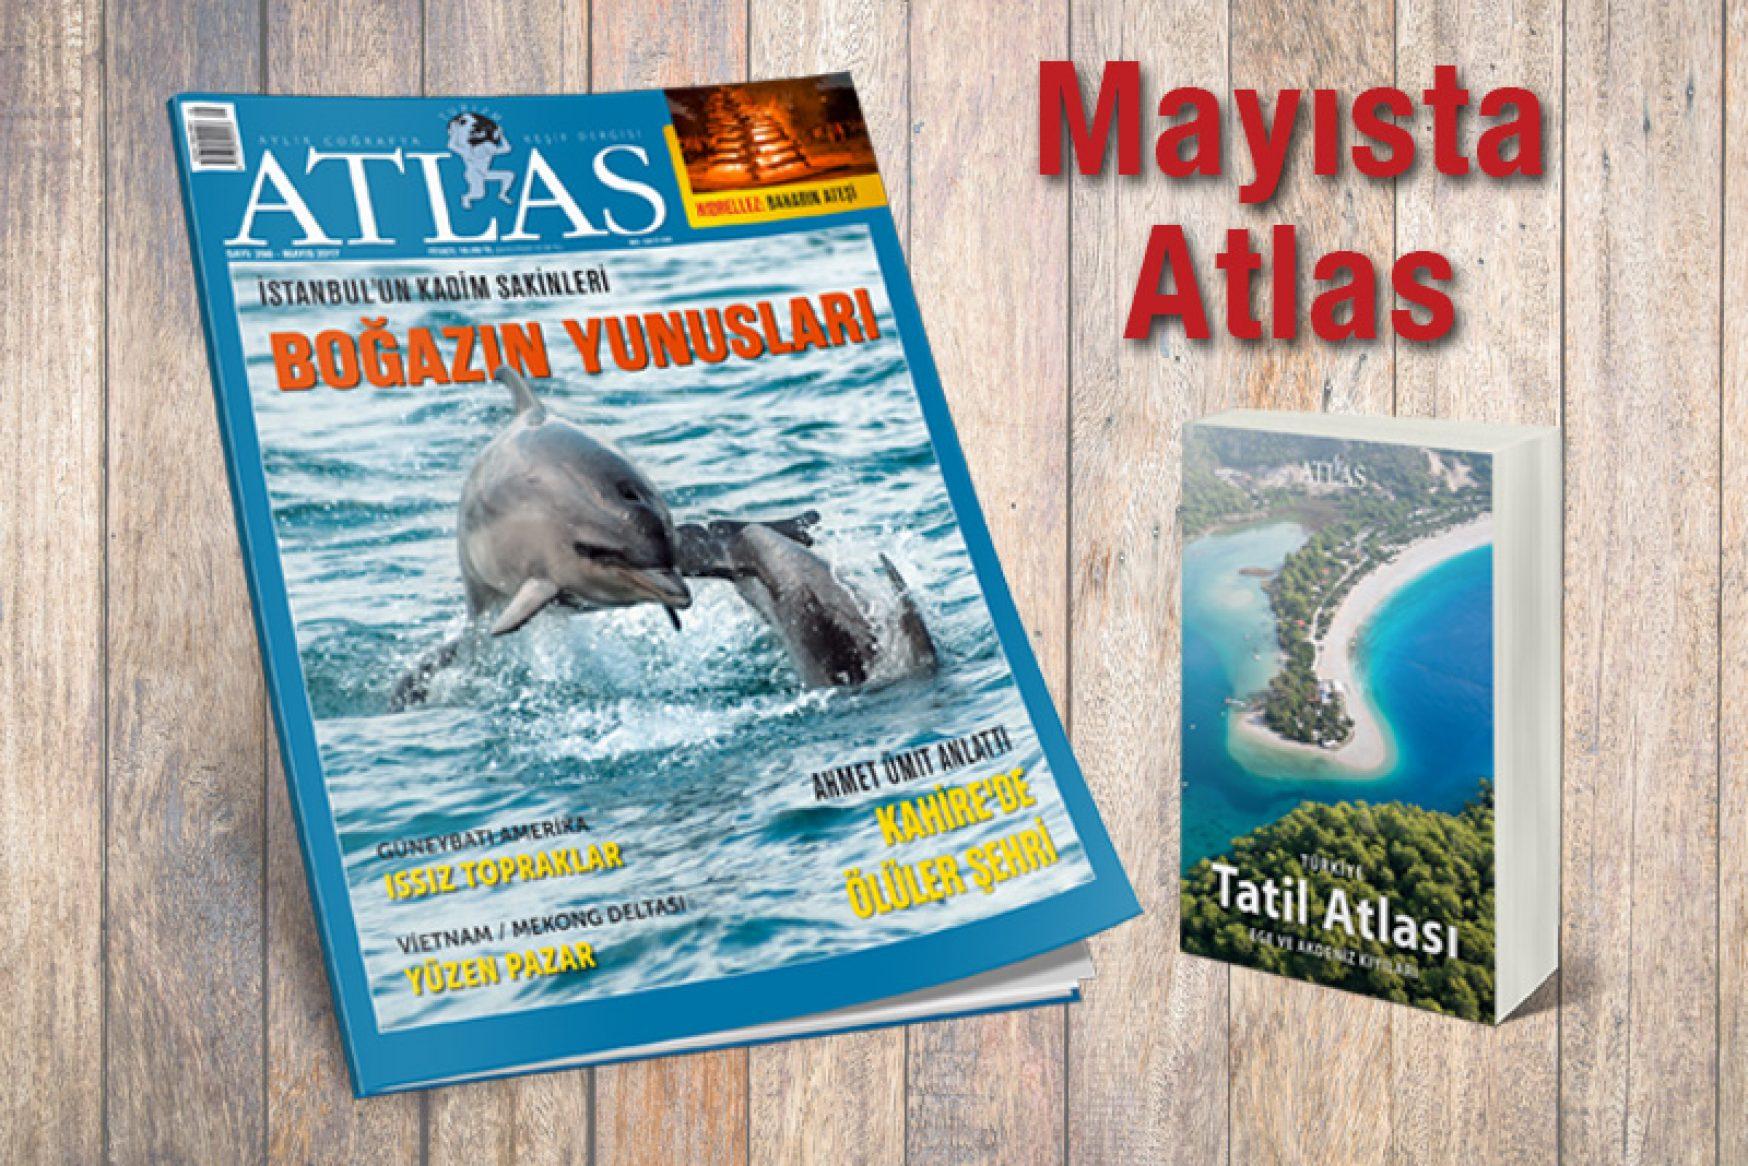 Mayısta Atlas